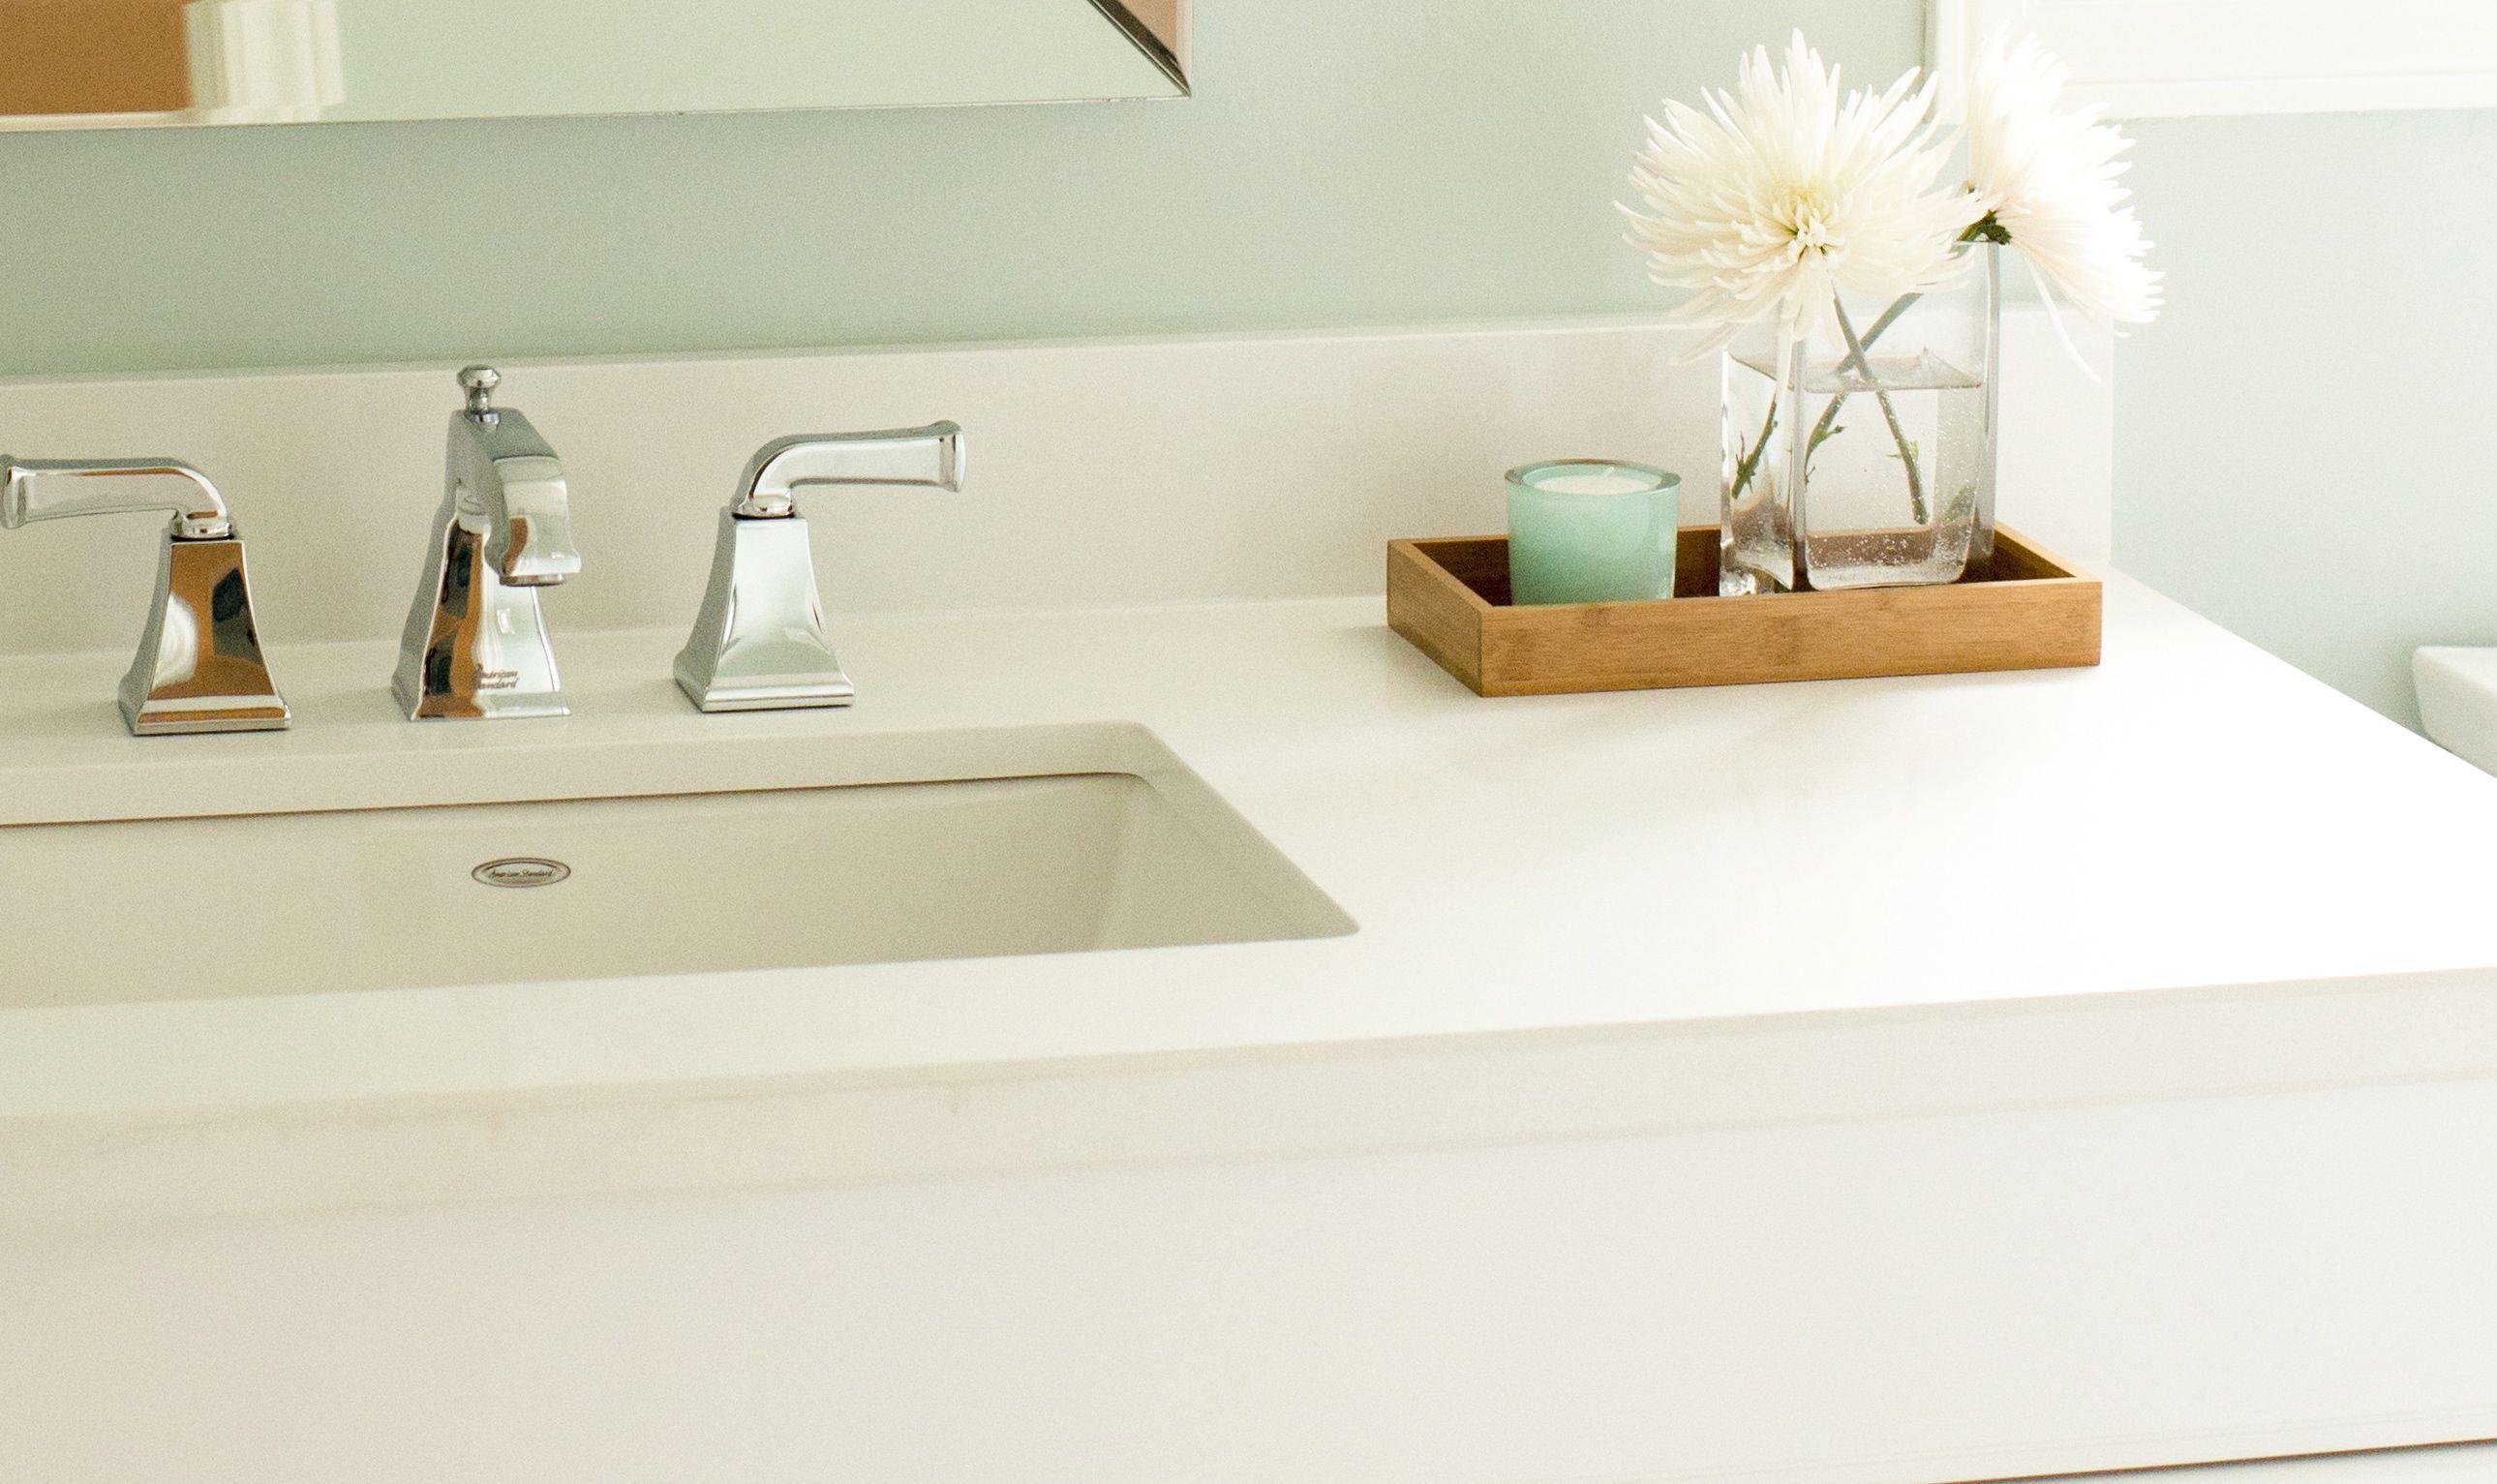 bathroom vanity countertop installation latitude on replacement countertops for bathroom vanity id=94548